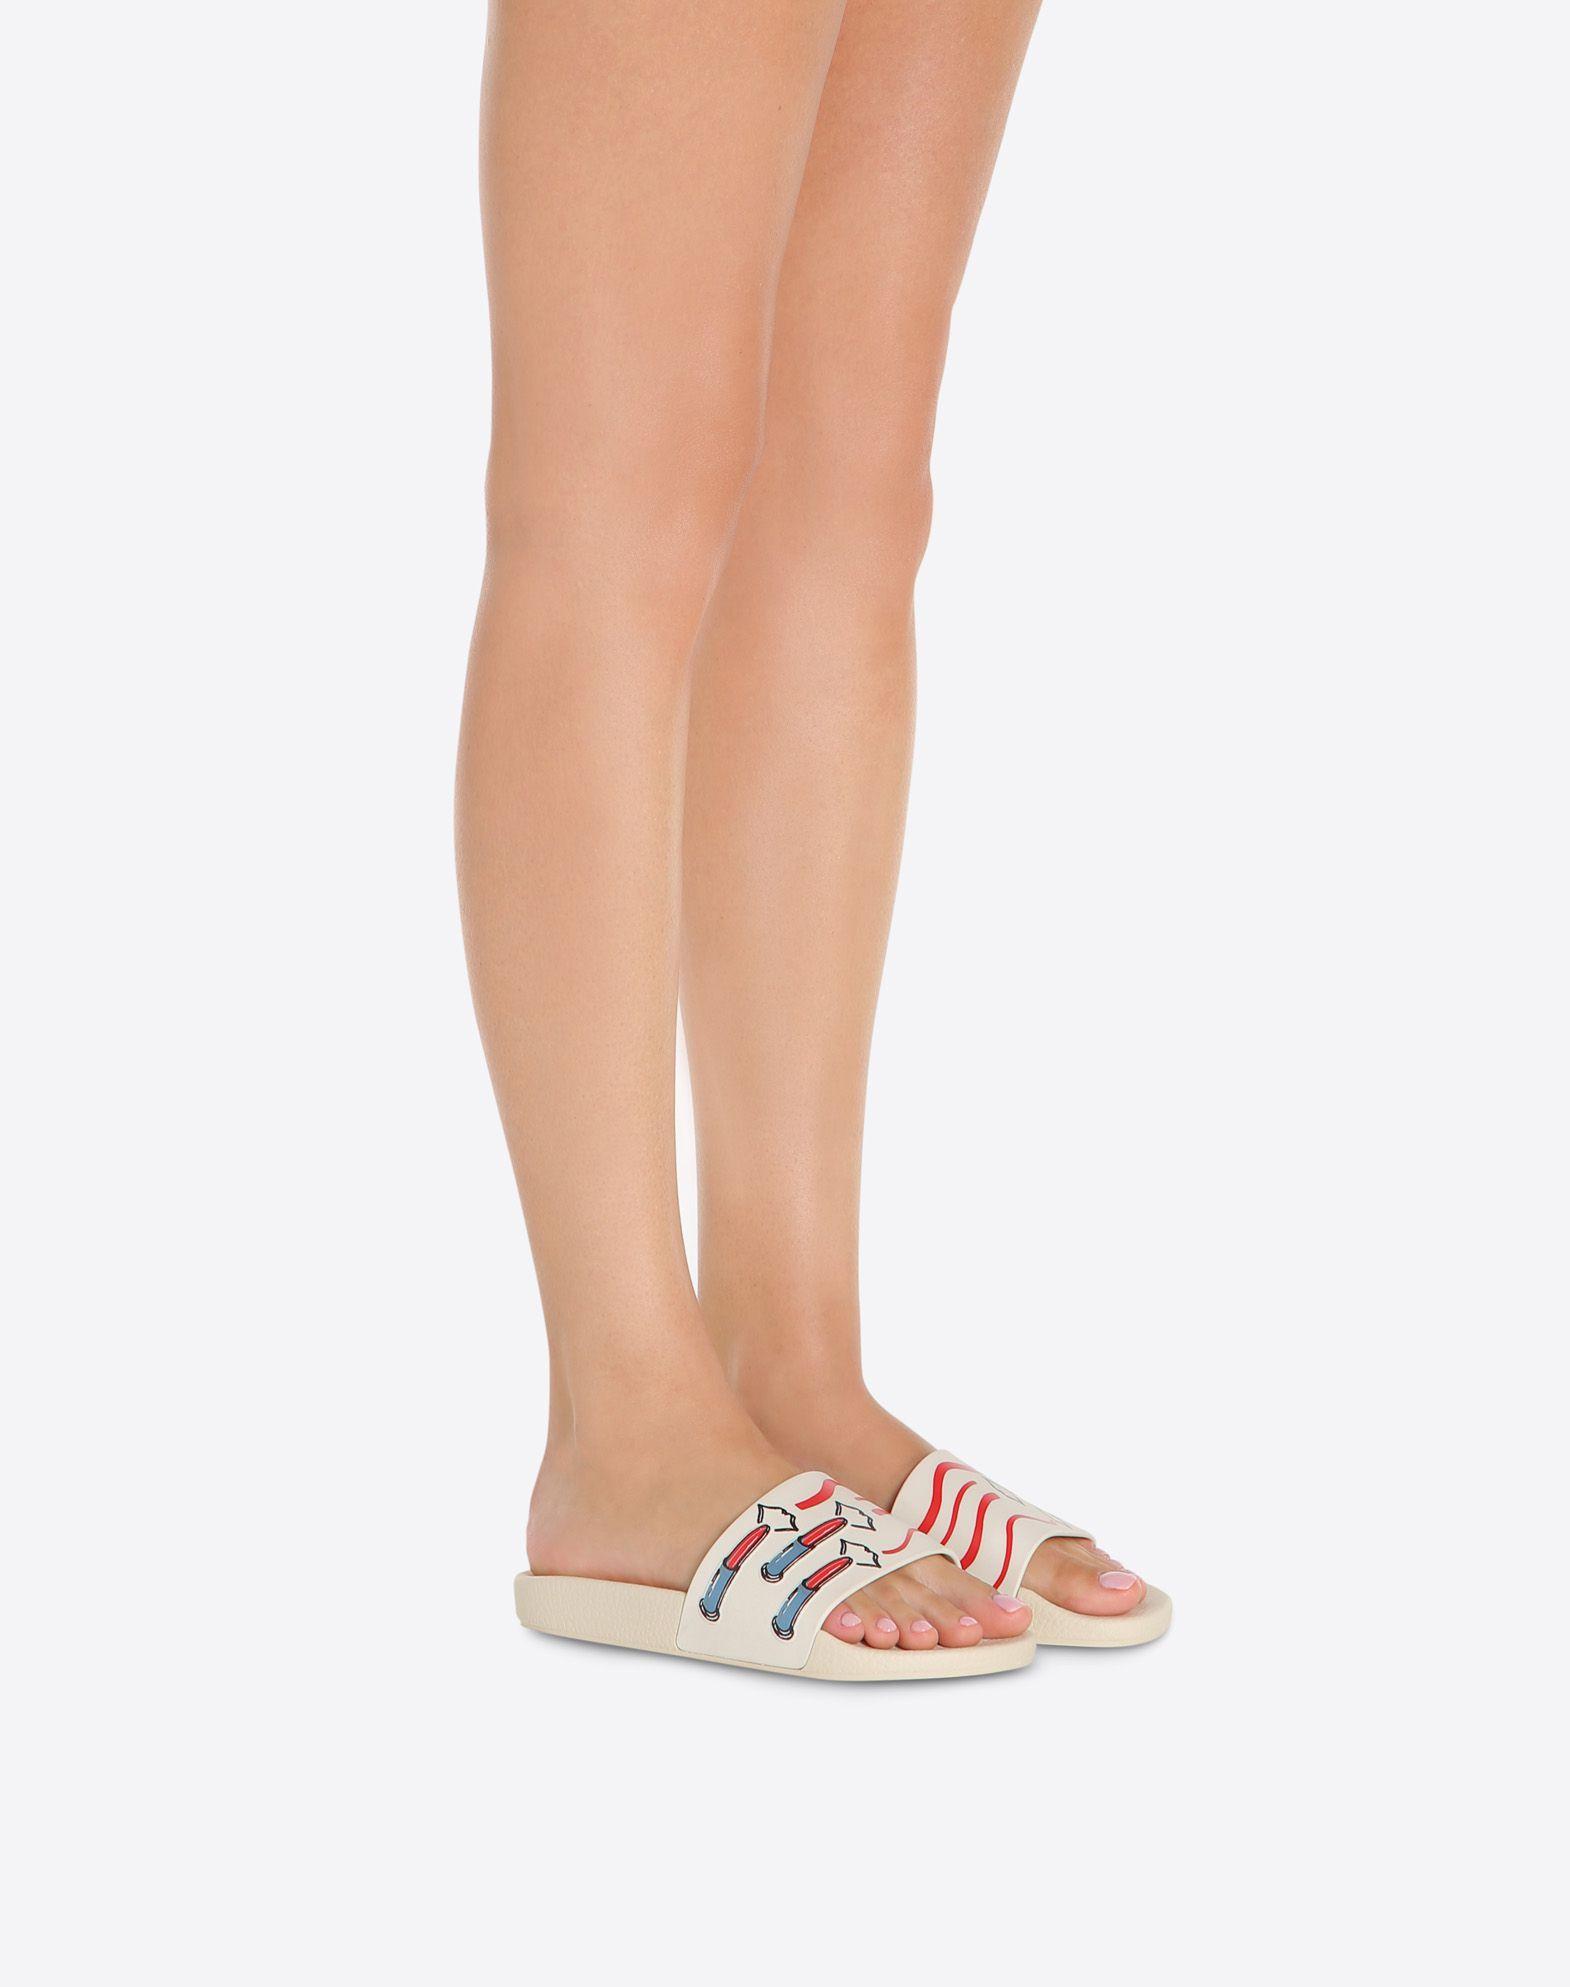 VALENTINO GARAVANI PVC Slide Sandal with Lipstick Print SLIDE SANDAL D a